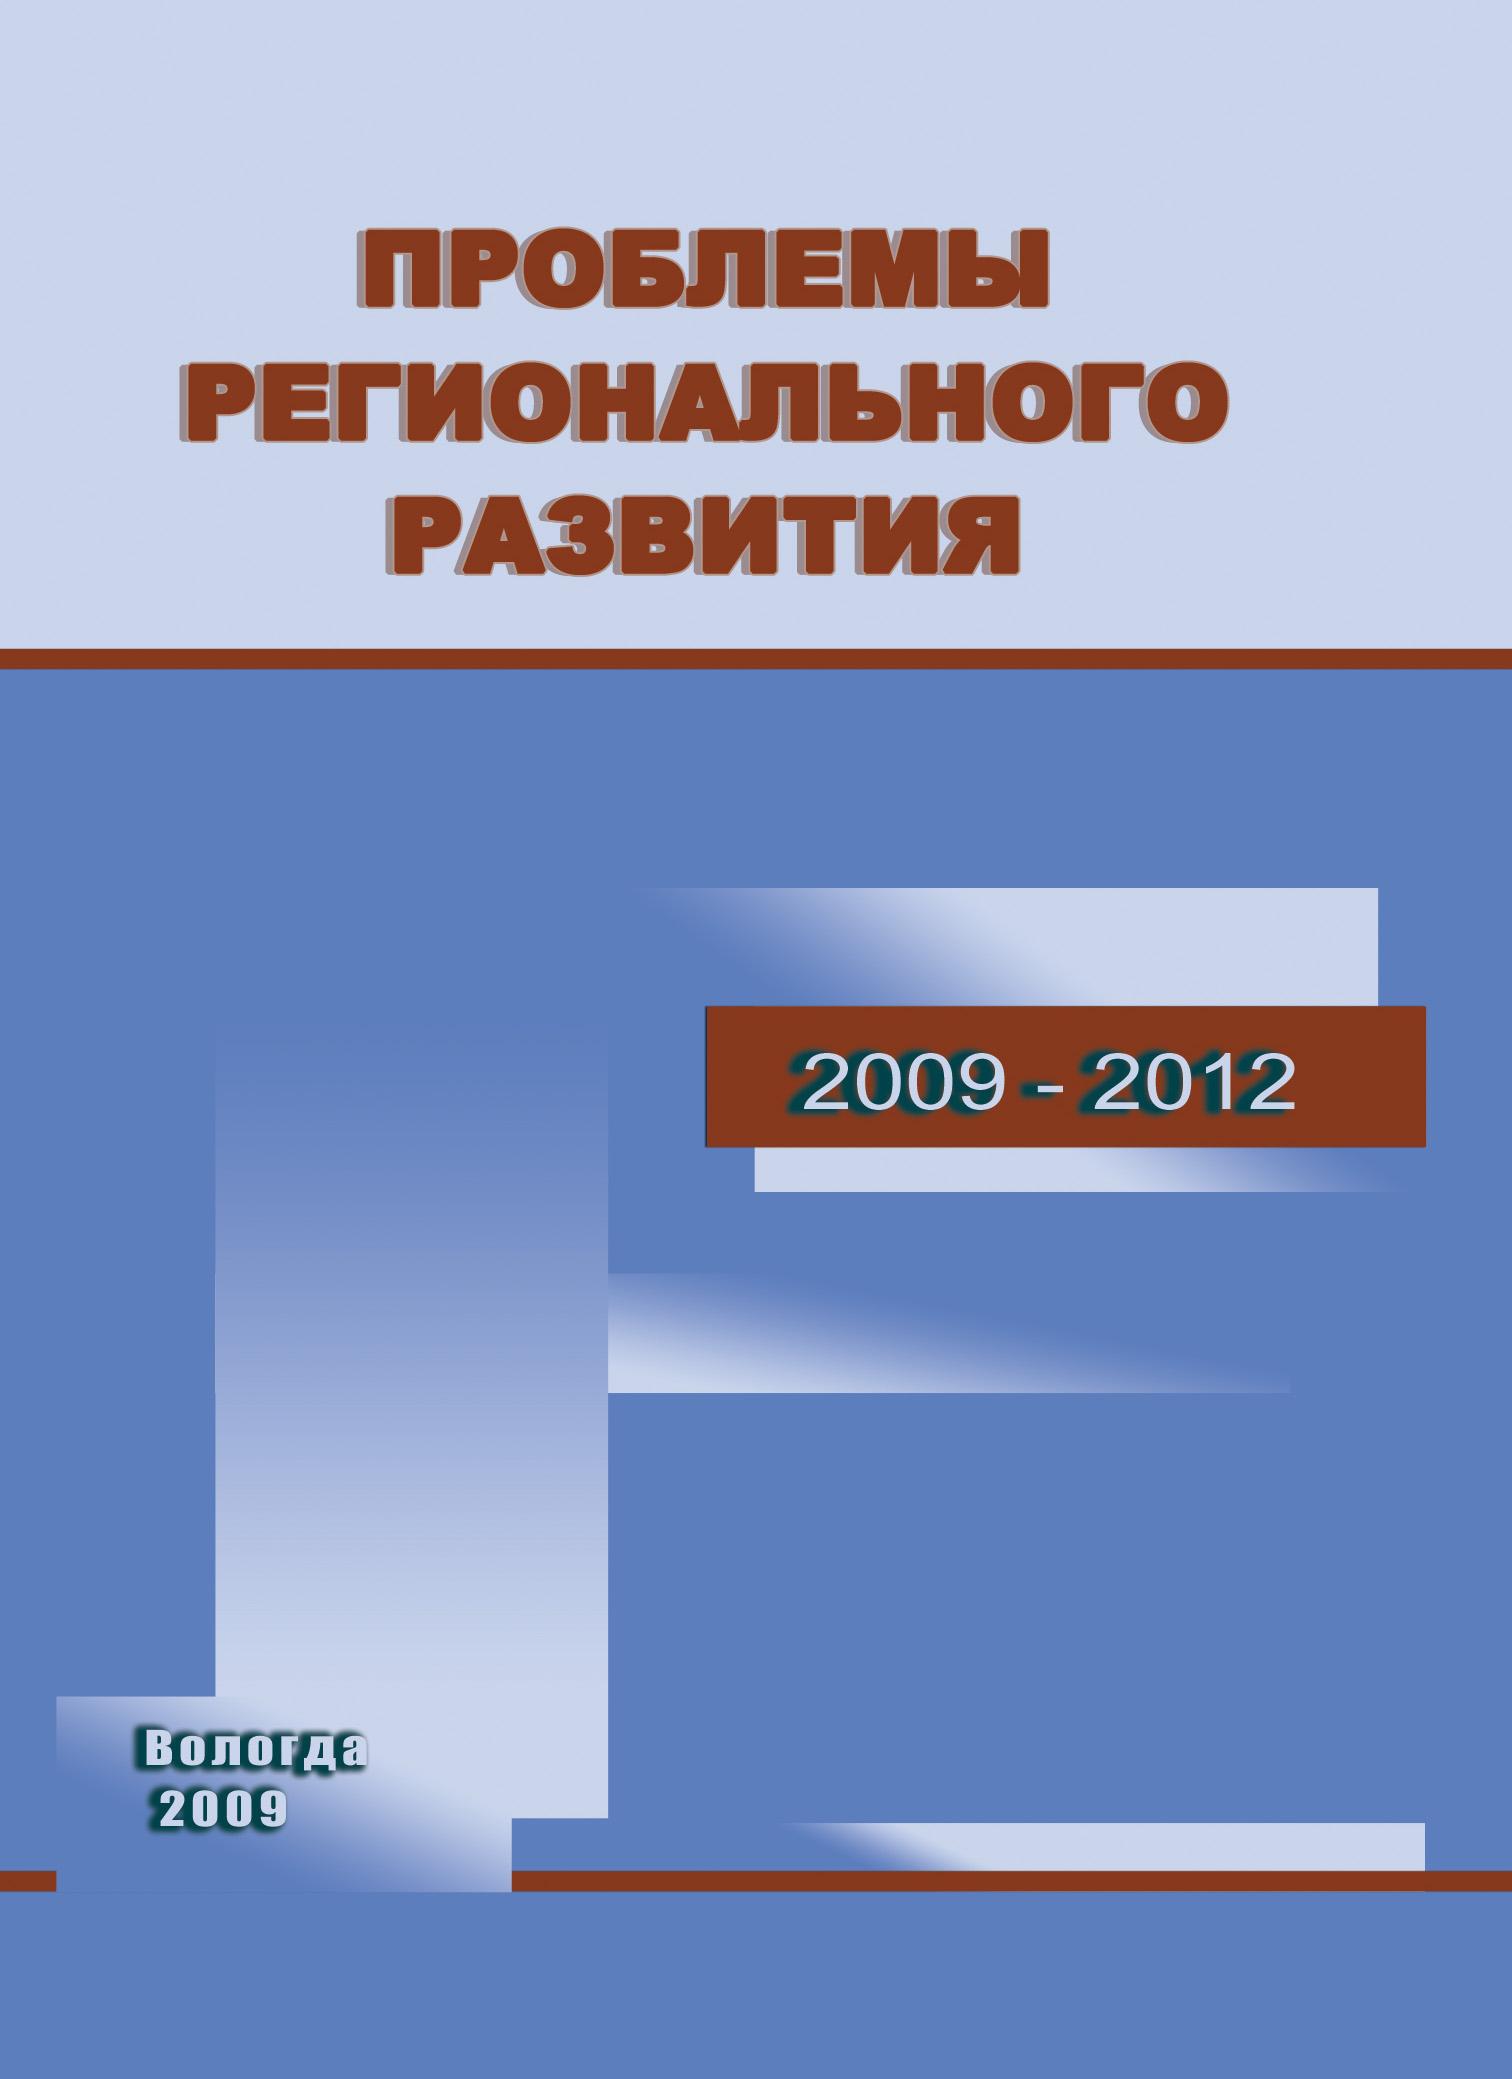 Обложка книги. Автор - Татьяна Кожина